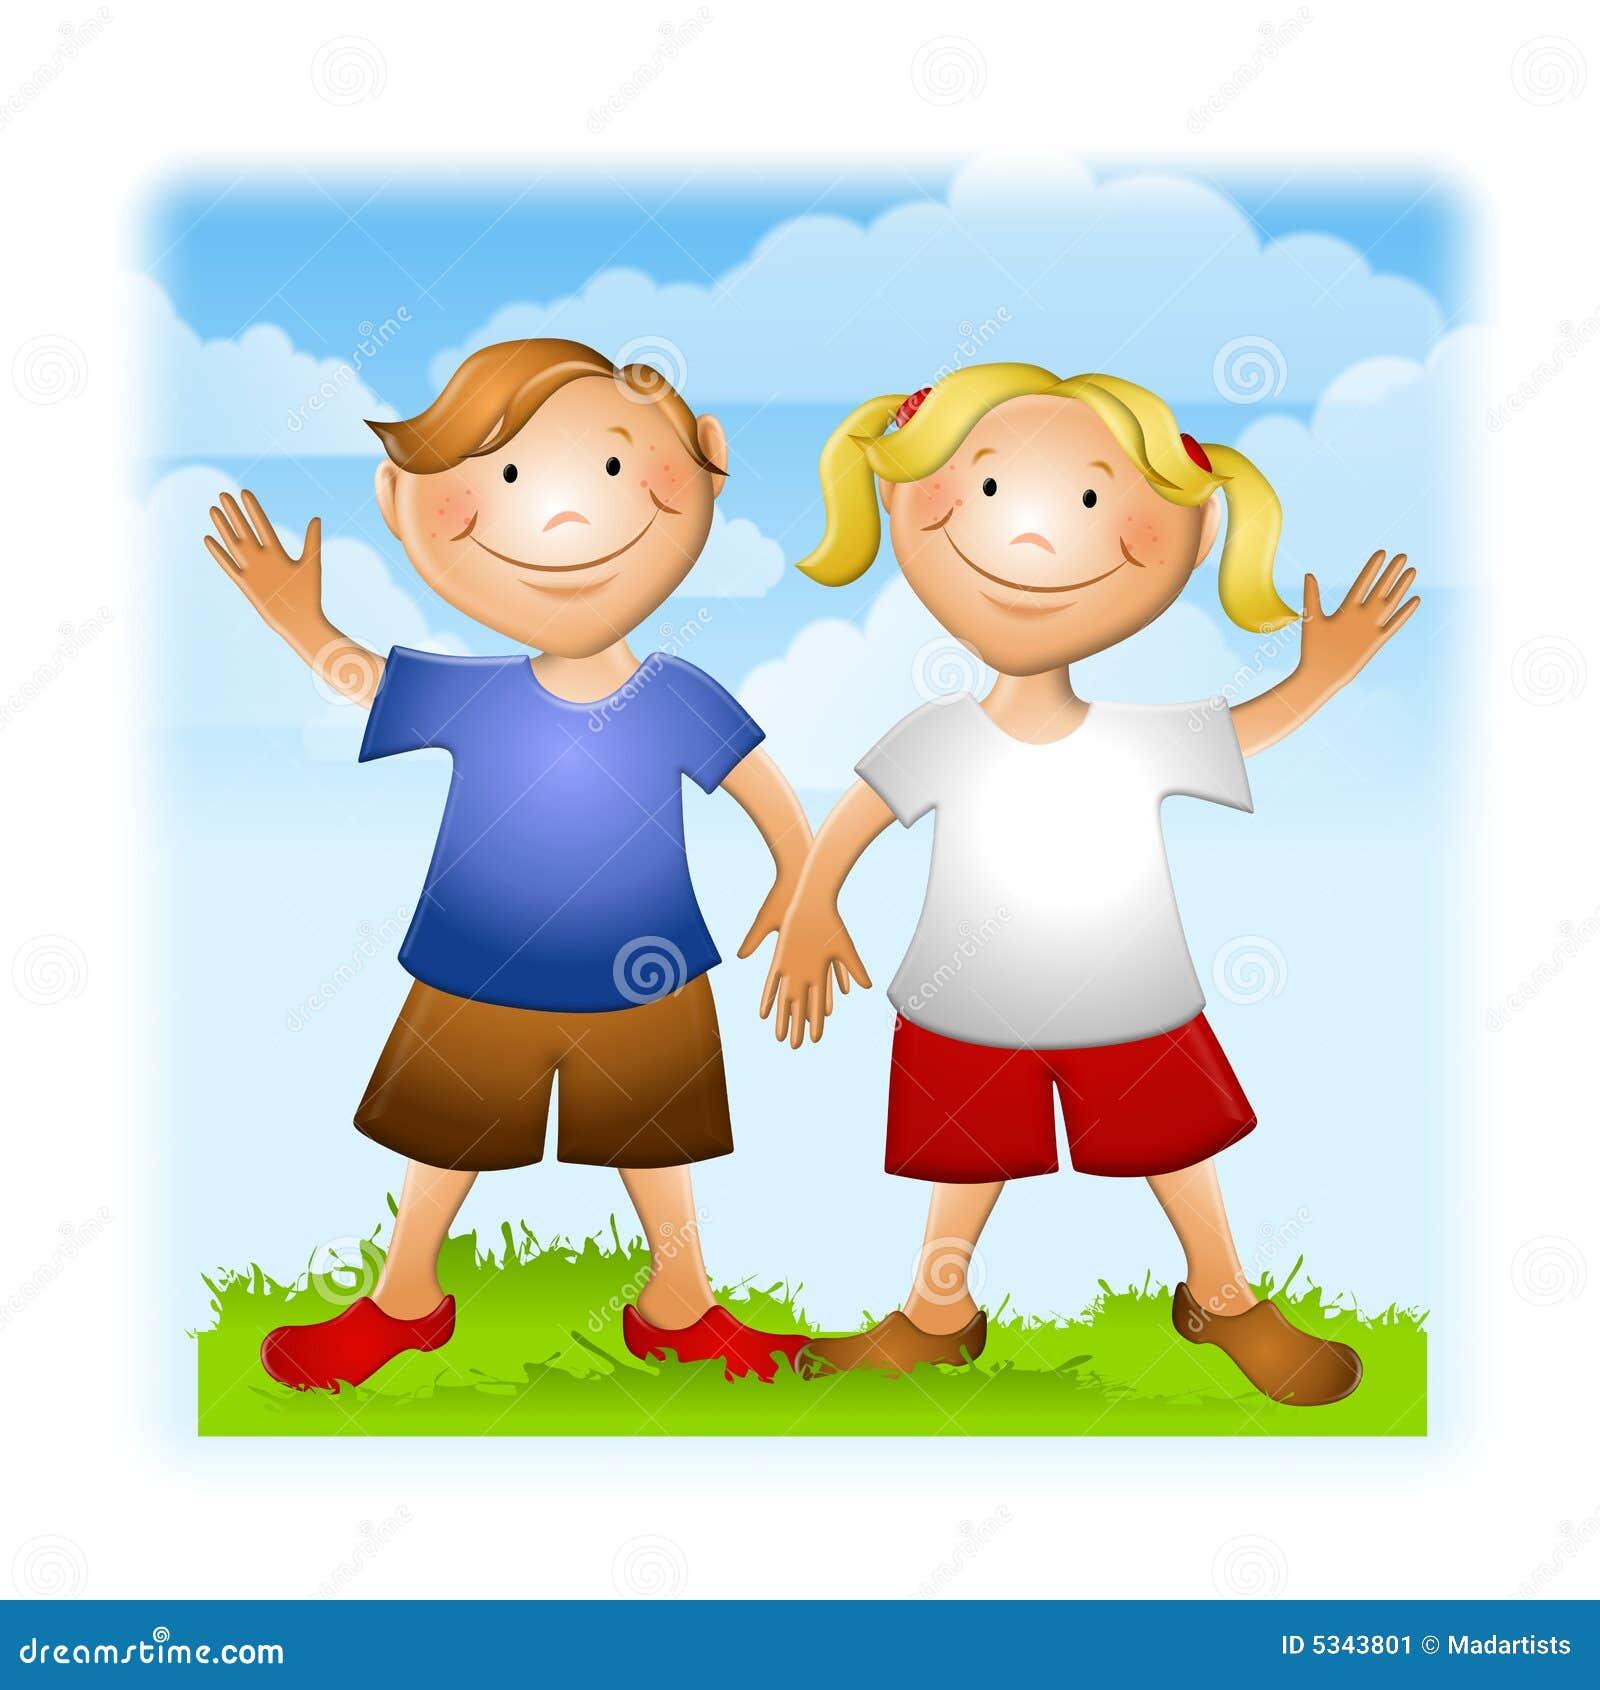 summer kids holding hands waving stock illustration